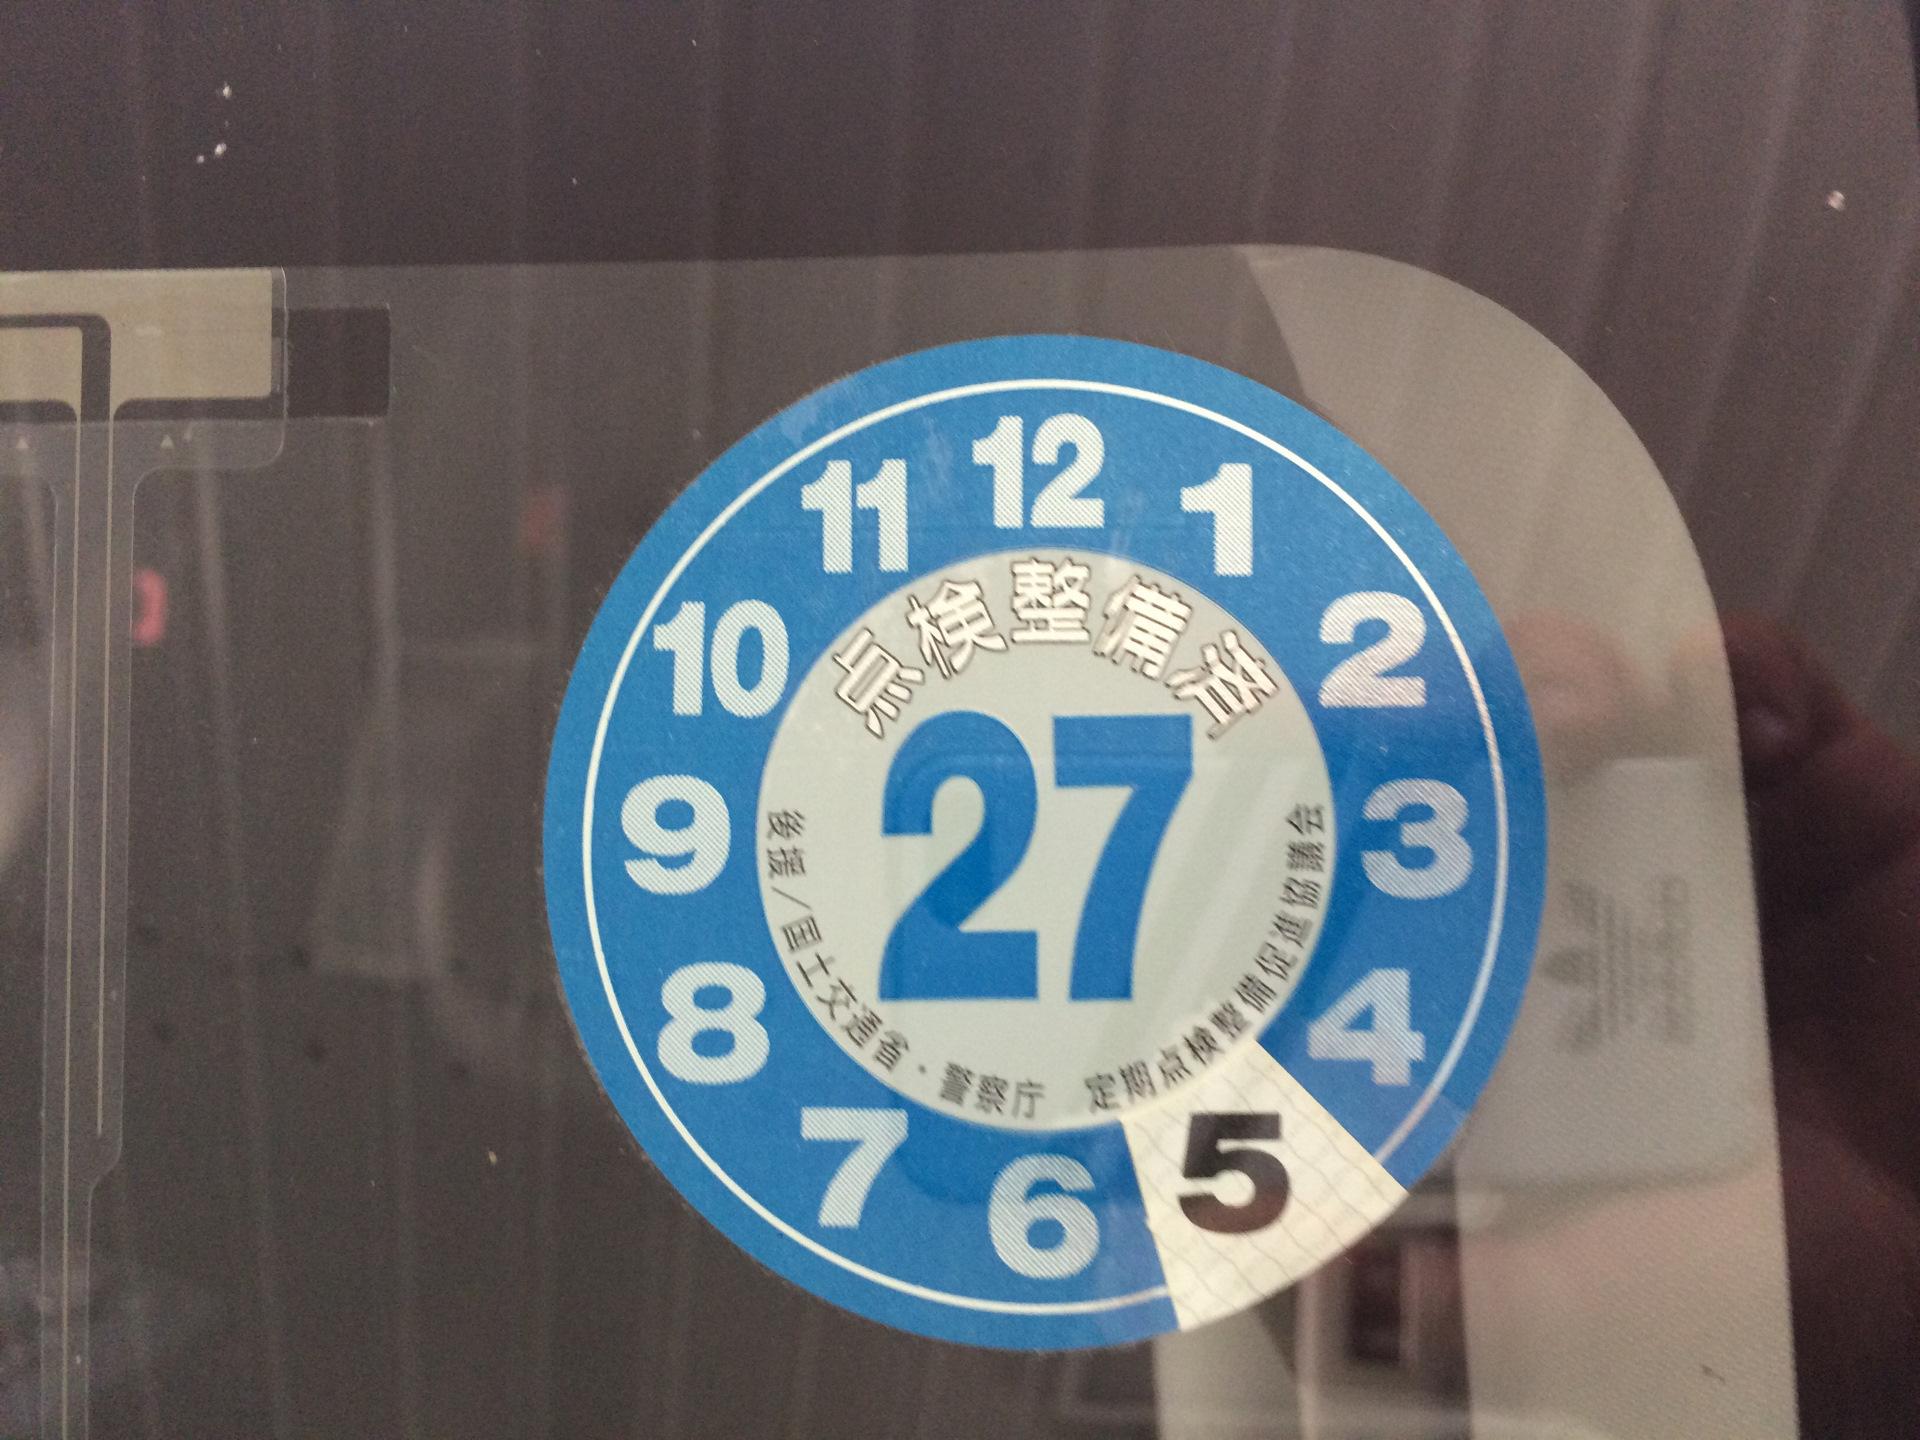 Наклейка на автомобиле в Японии